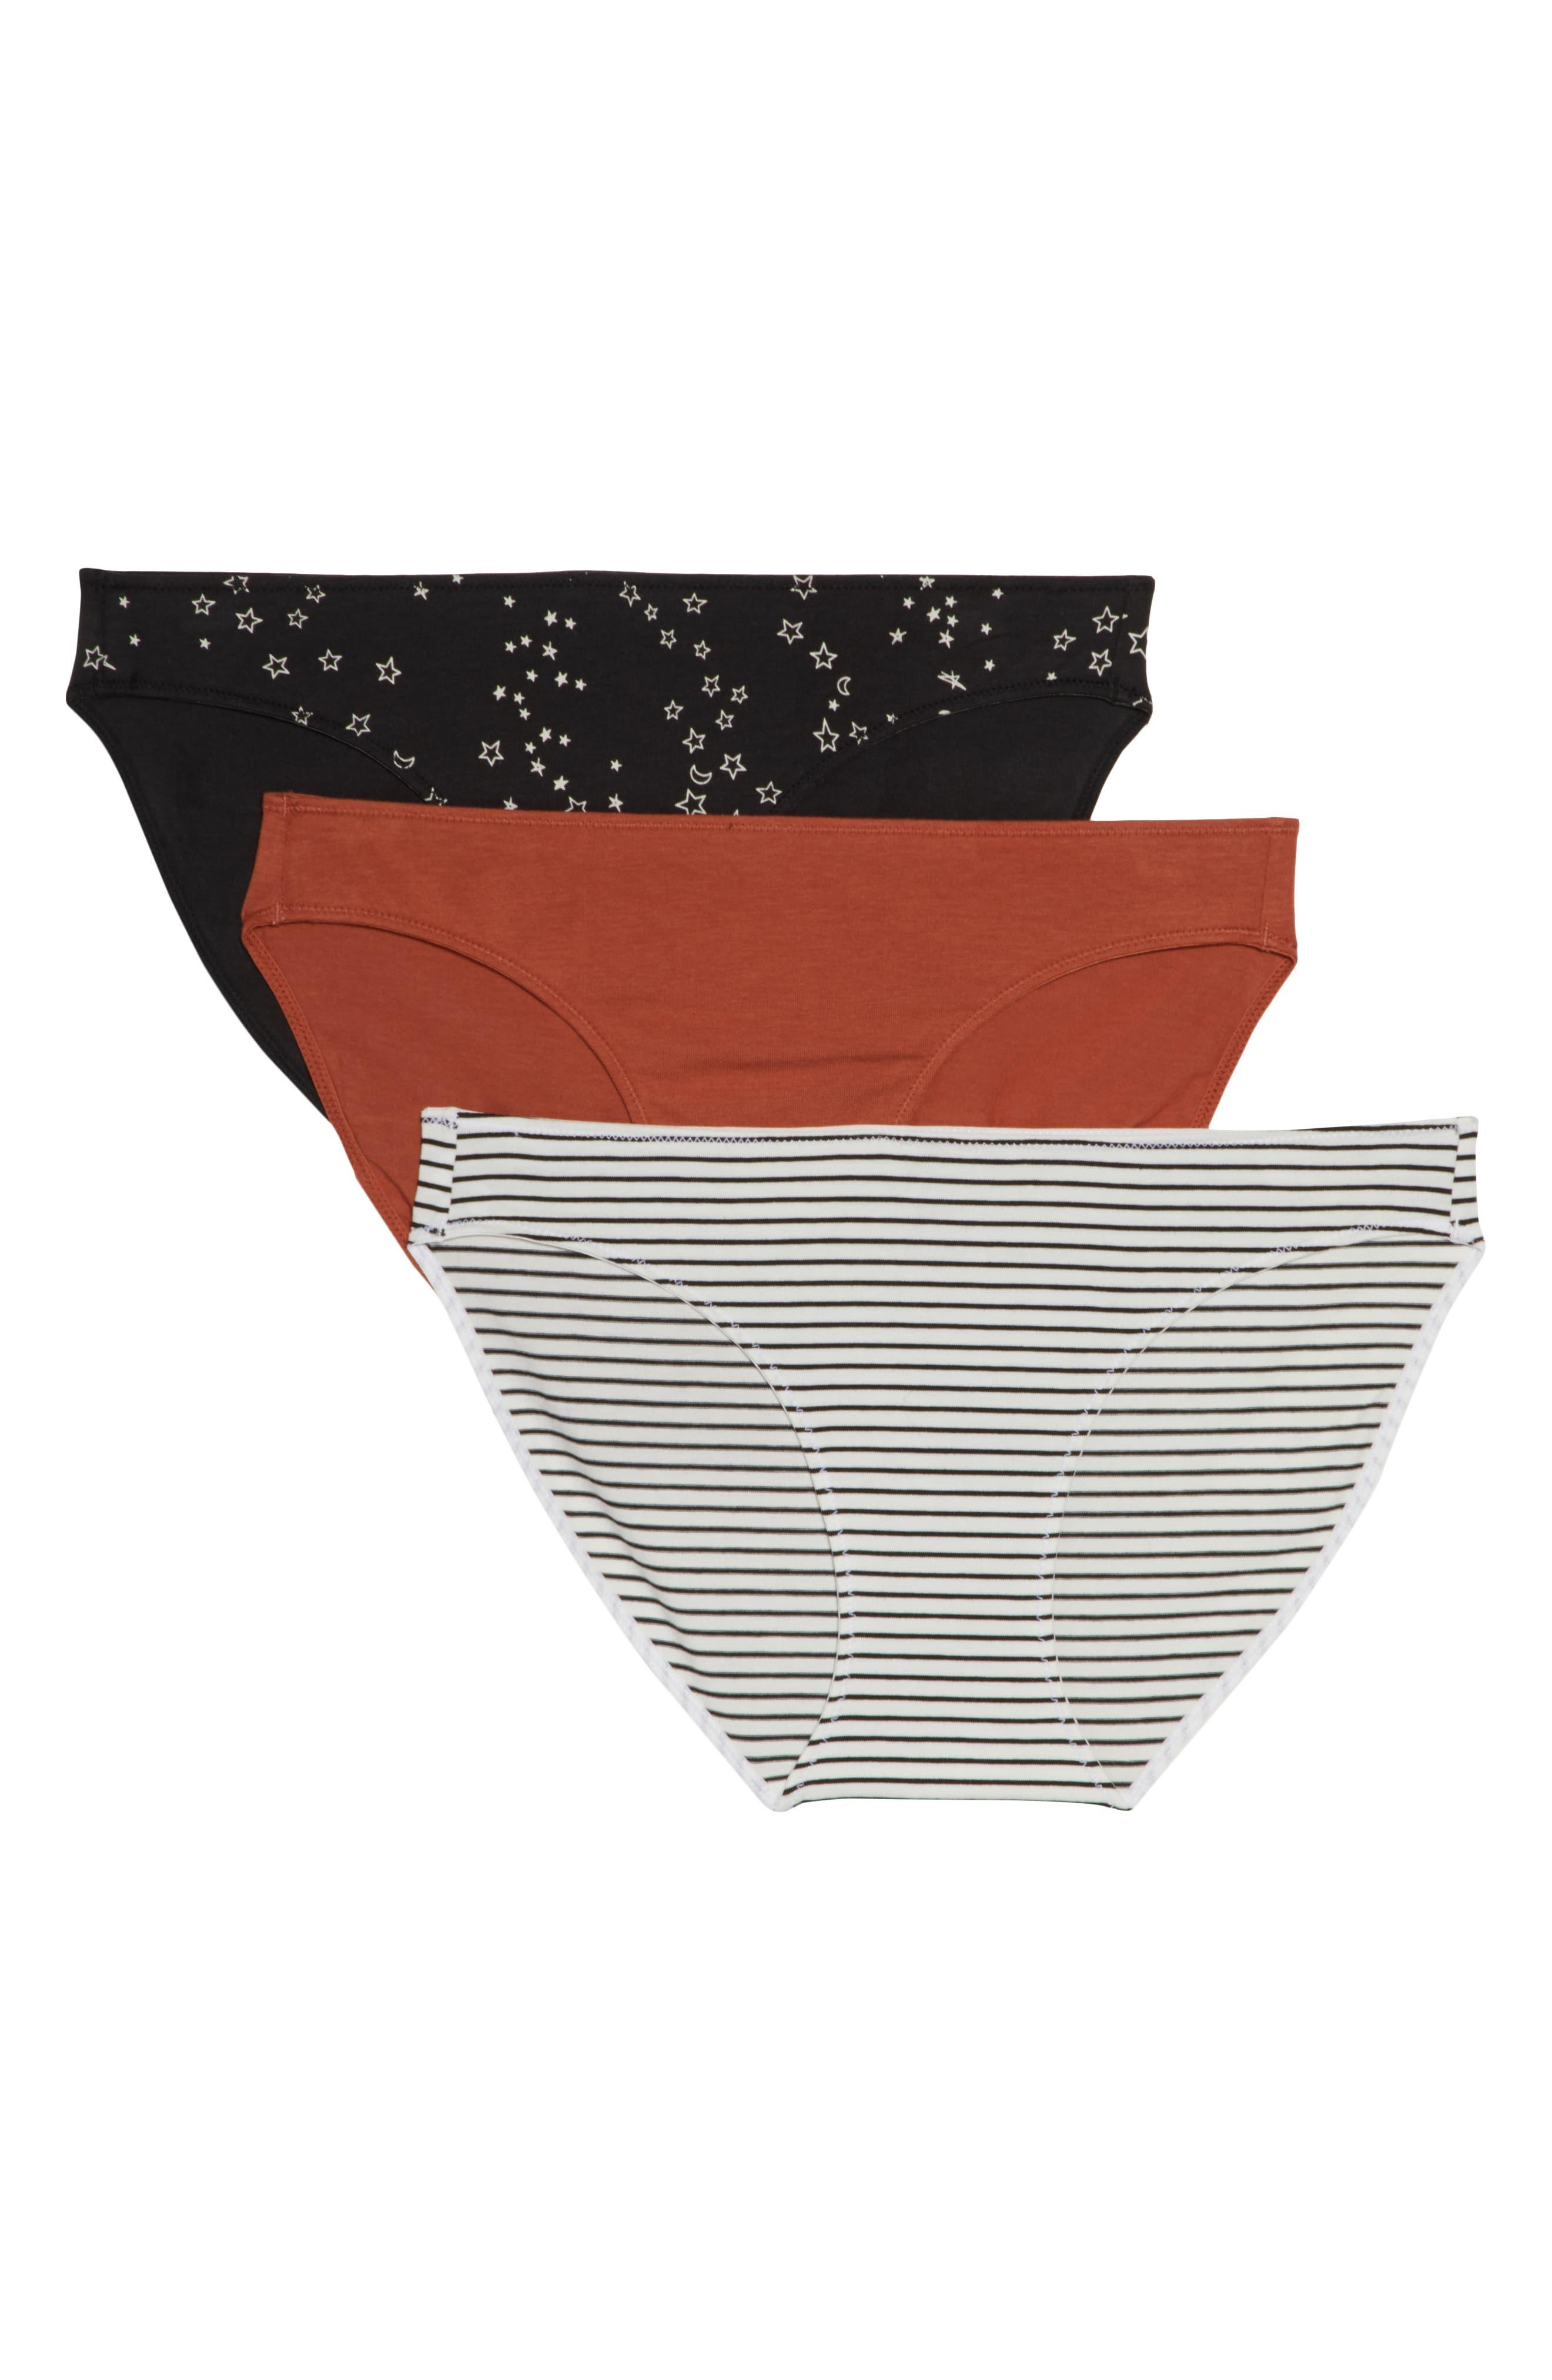 3-Pack Bikini,                             Main thumbnail 1, color,                             TWISTED RED STRIPE